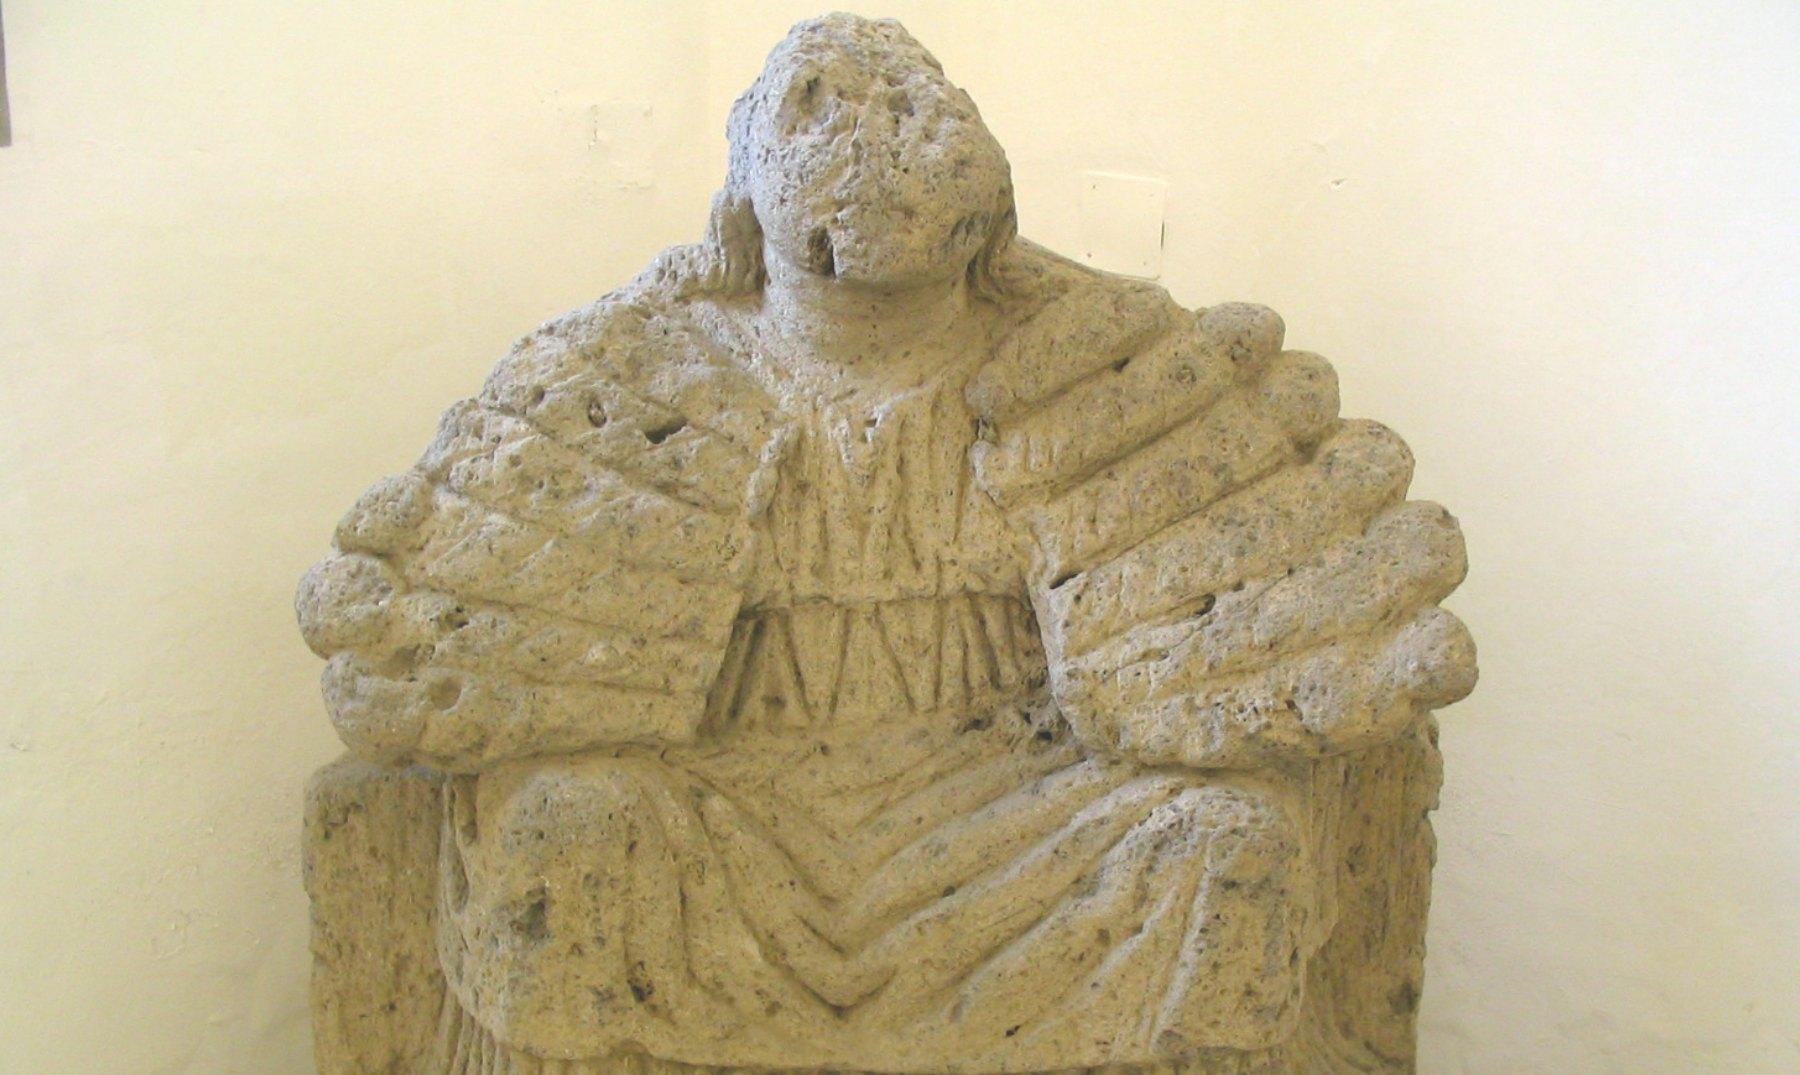 La salvaje Fiesta Matralia romana